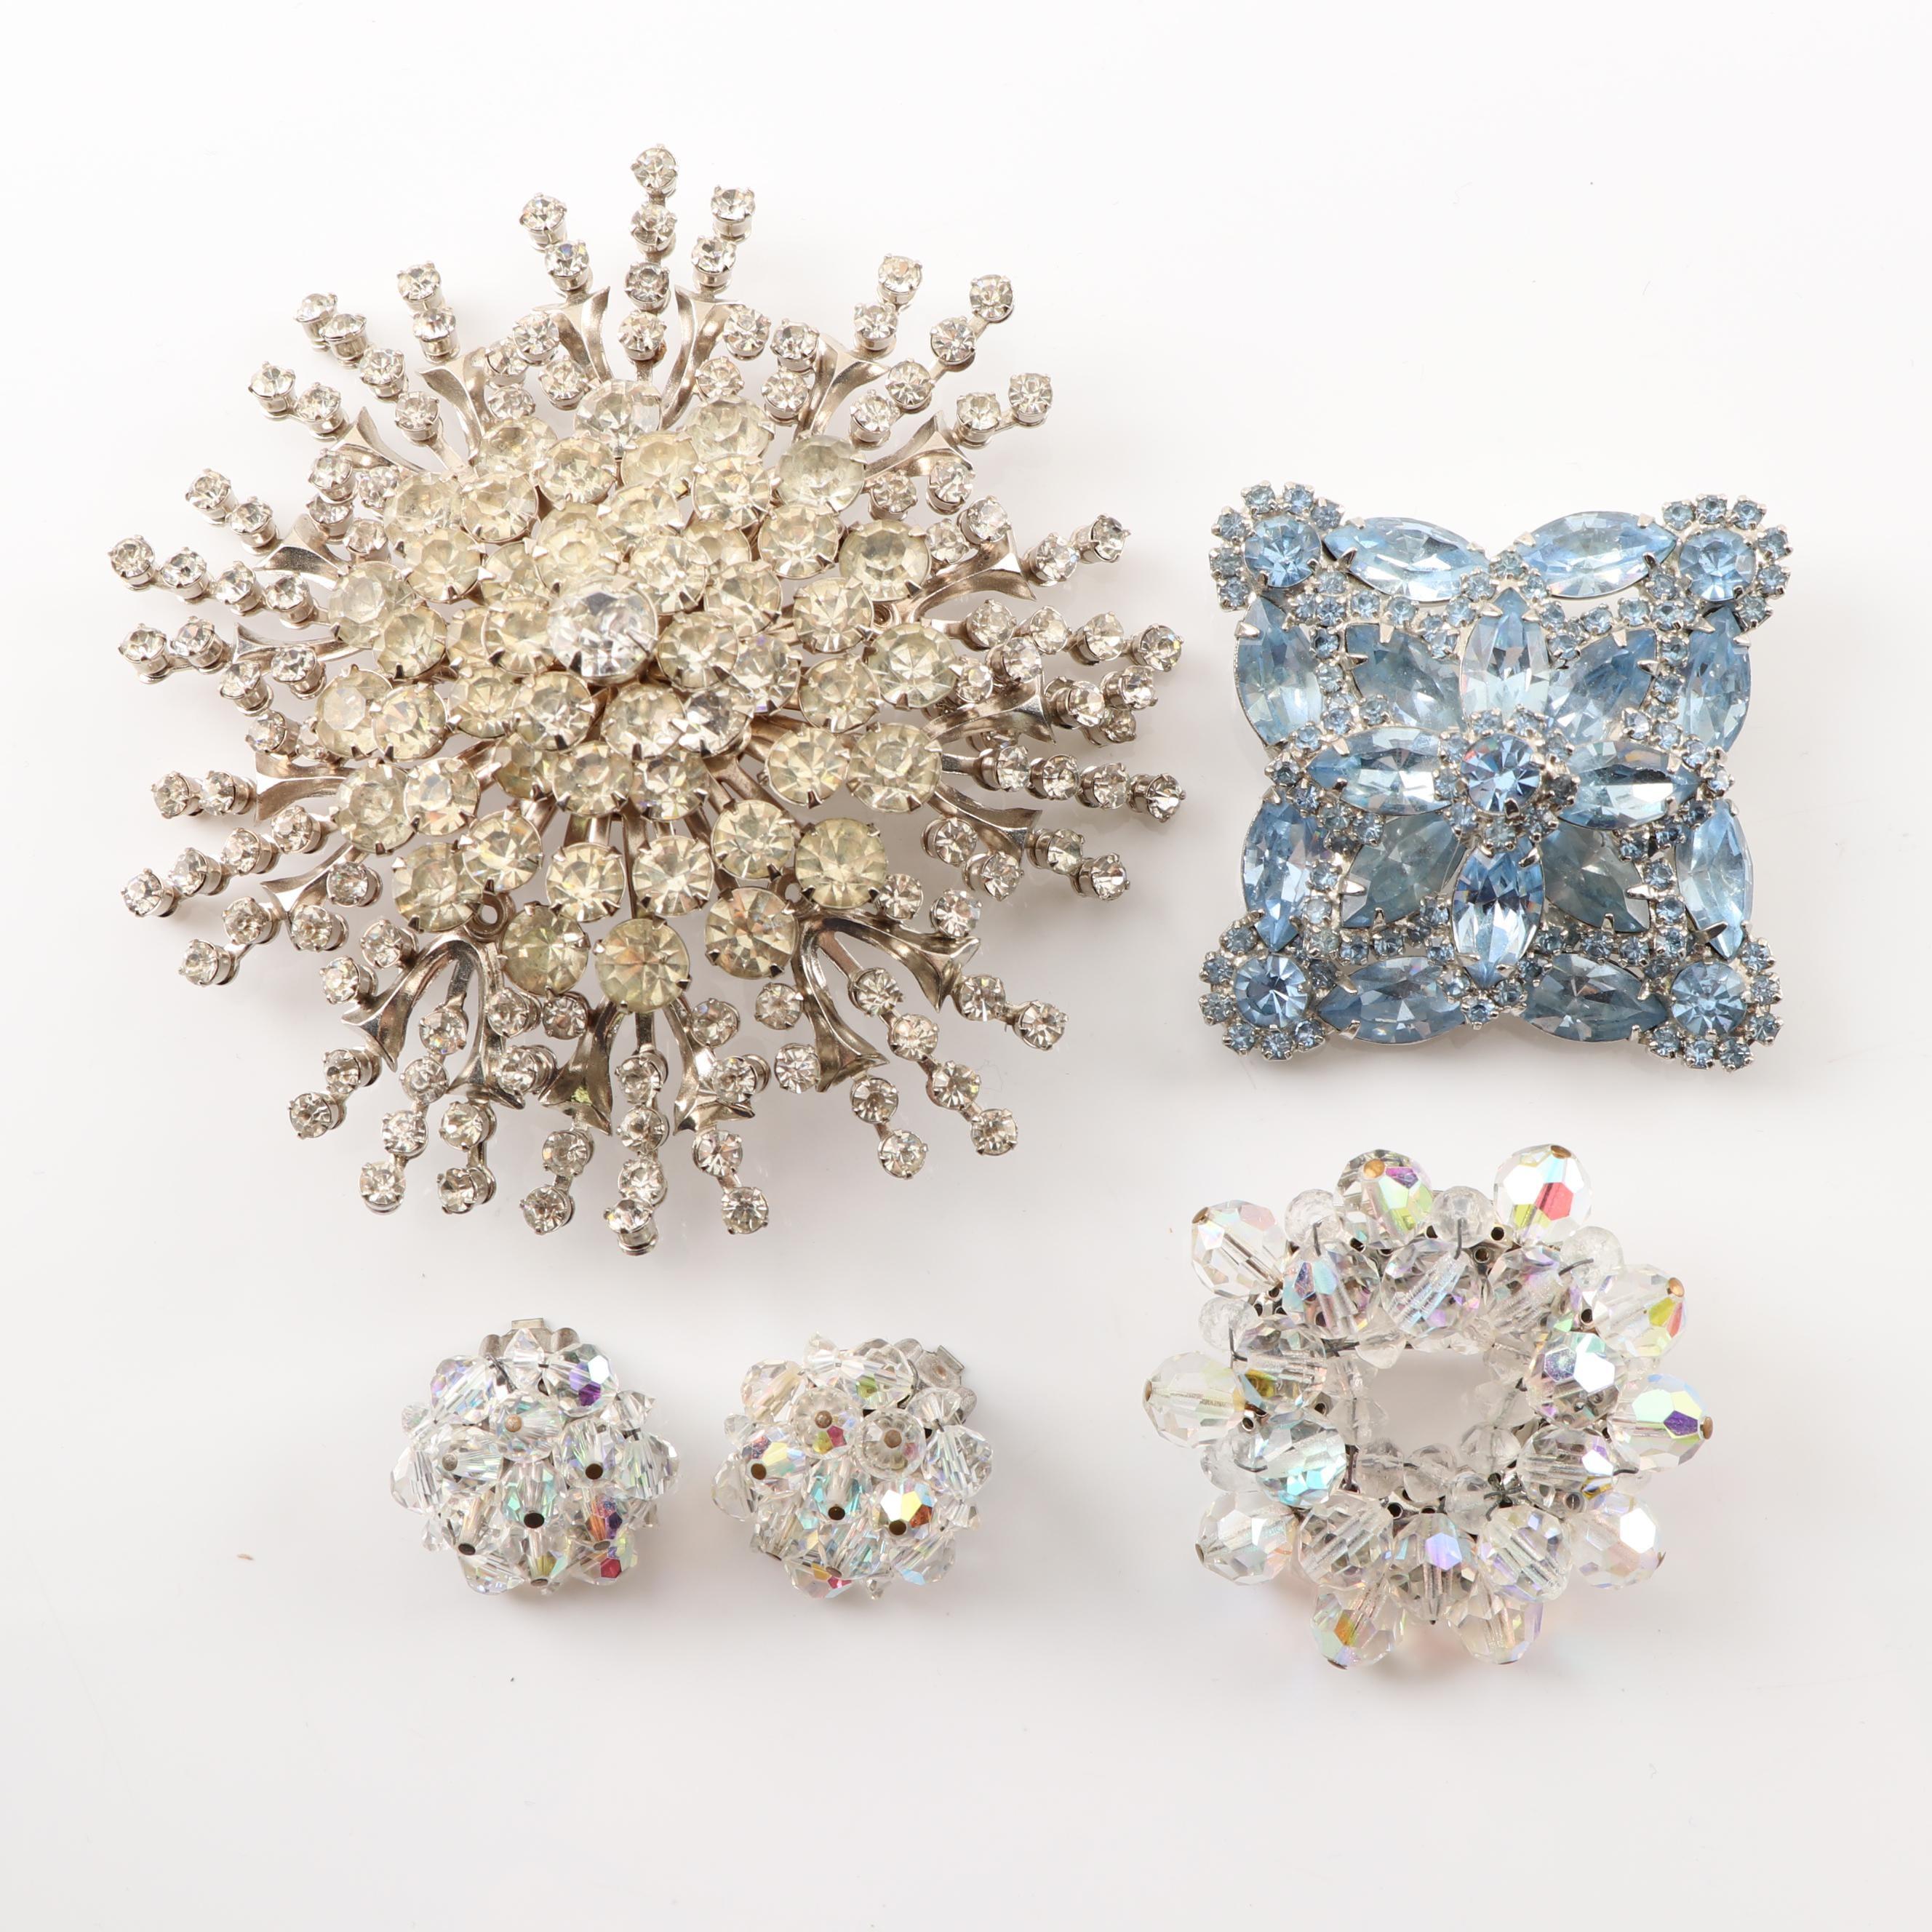 Rhinestone Brooches and Crystal Bead Demi - Parure